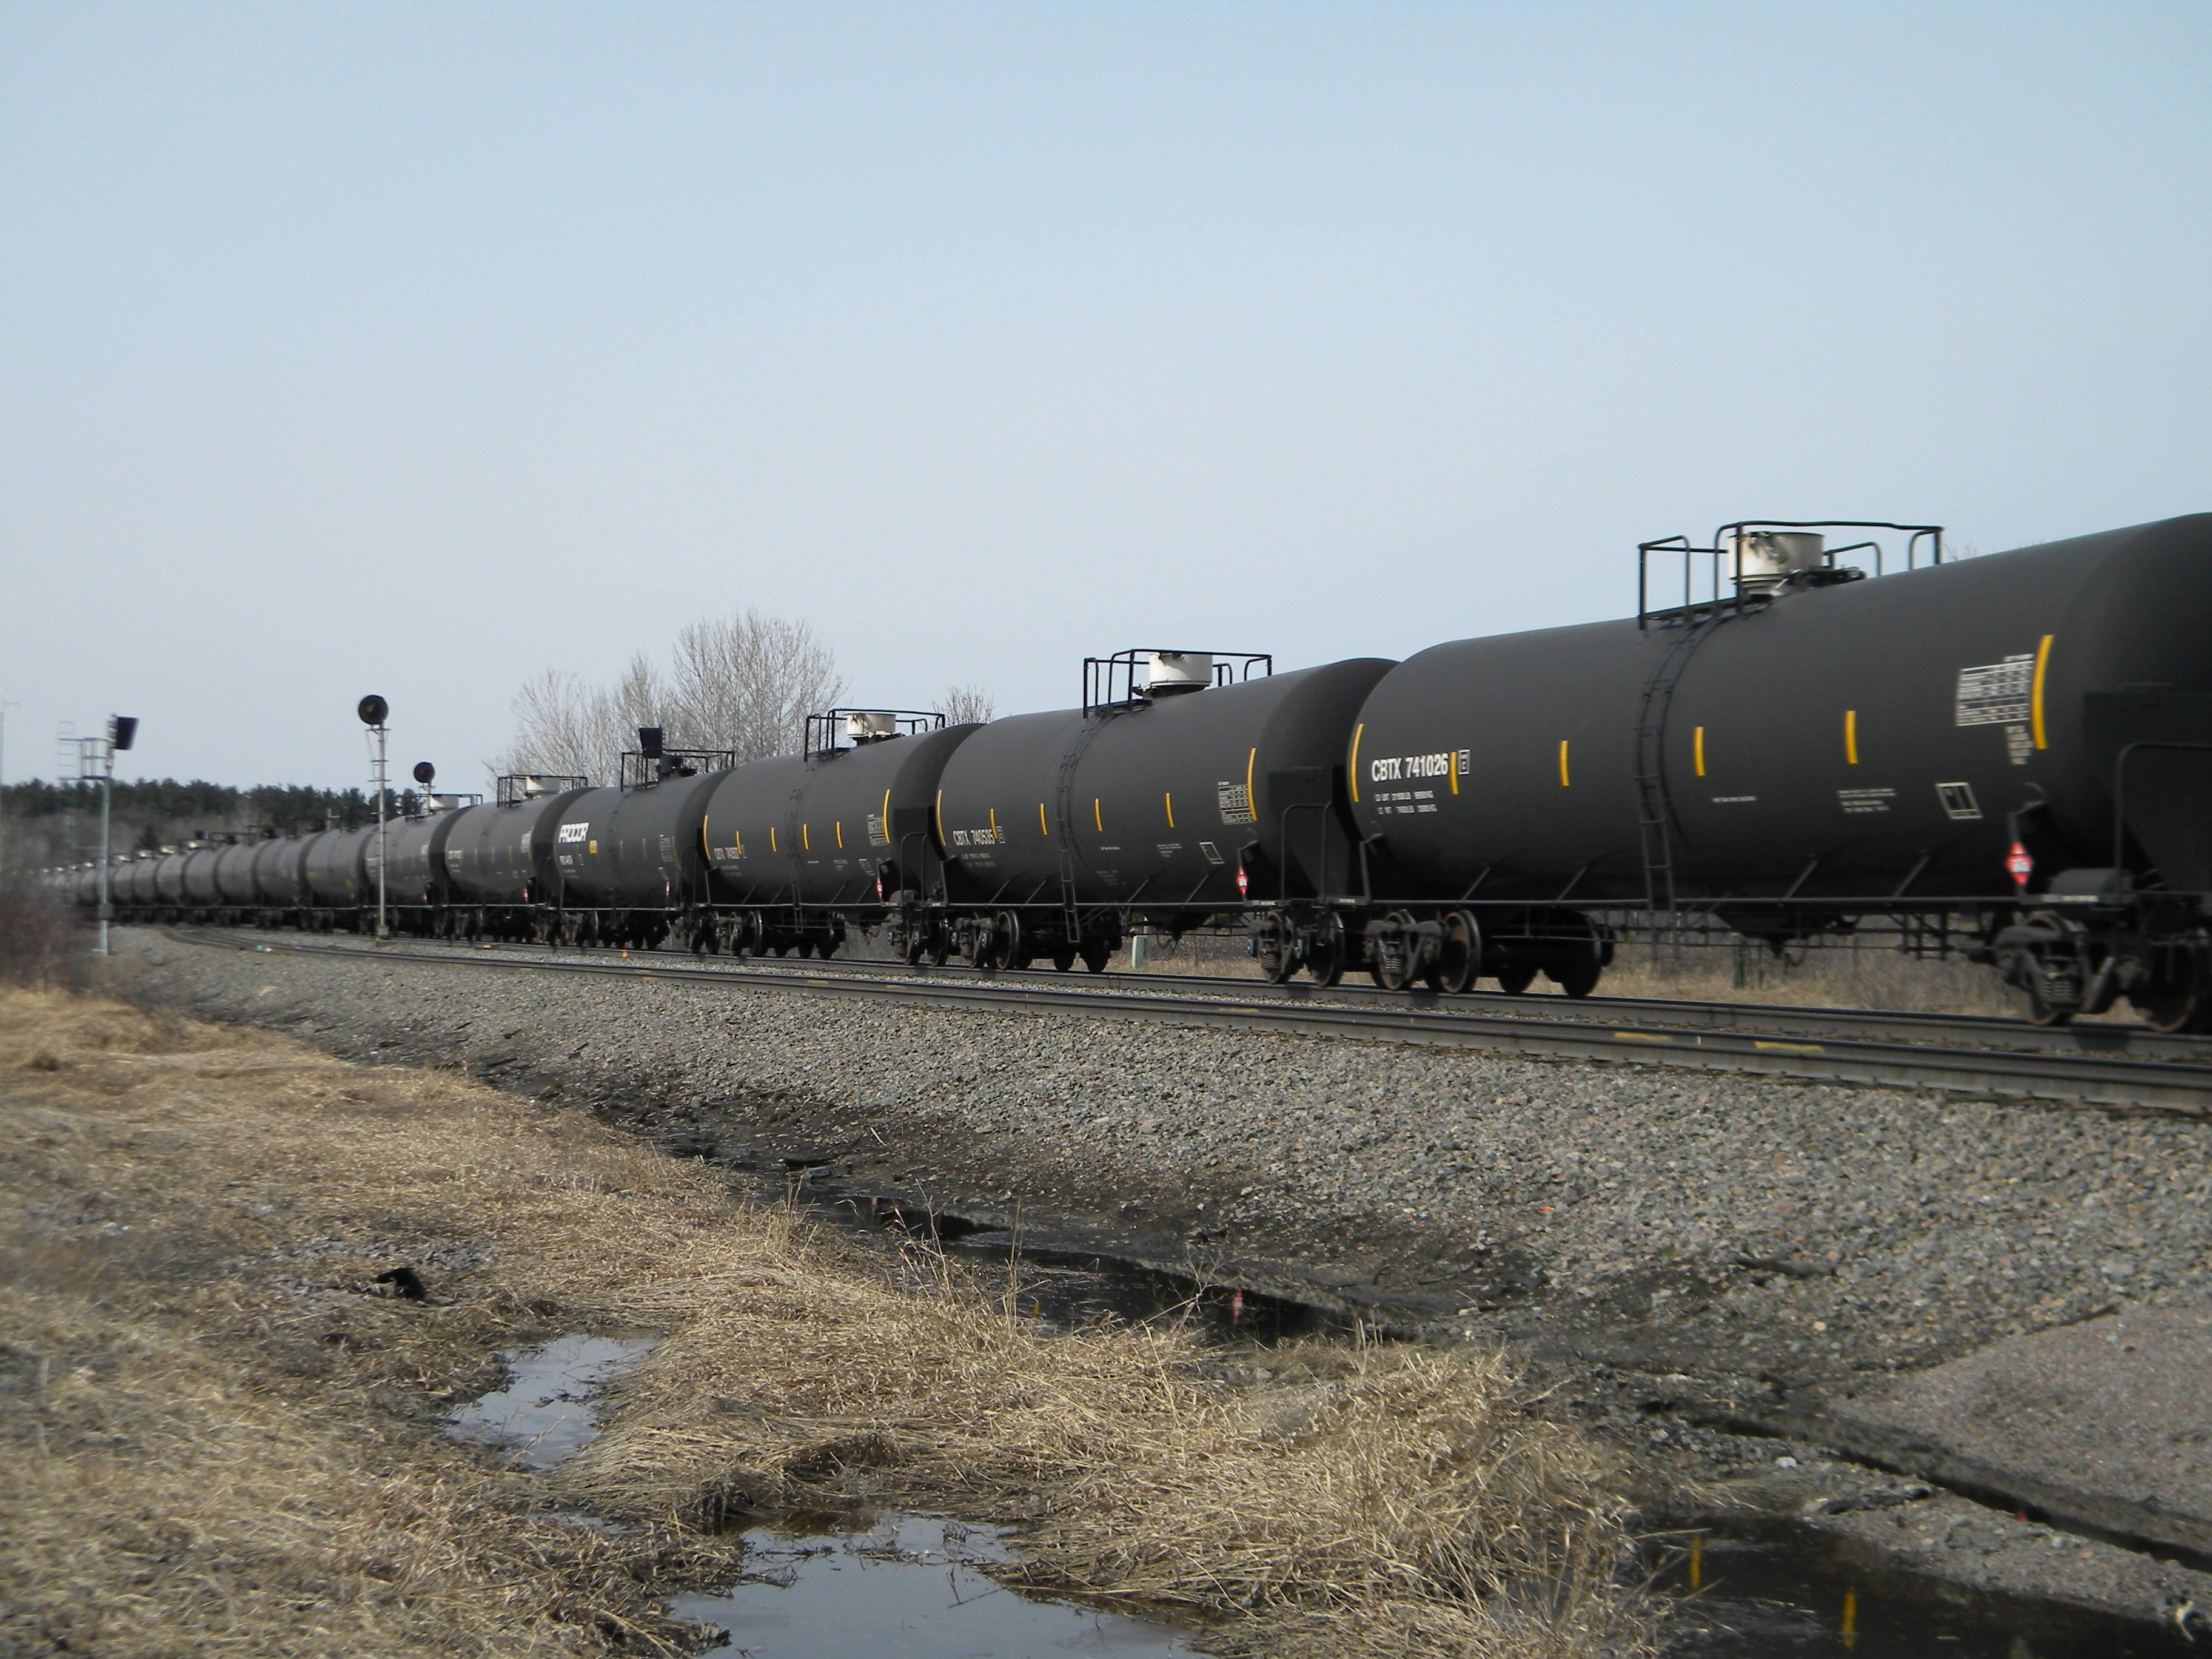 An oil-tank train with crude oil from the Bakken shale fields of North Dakota travels near Staples, Minn., on April 15, 2014